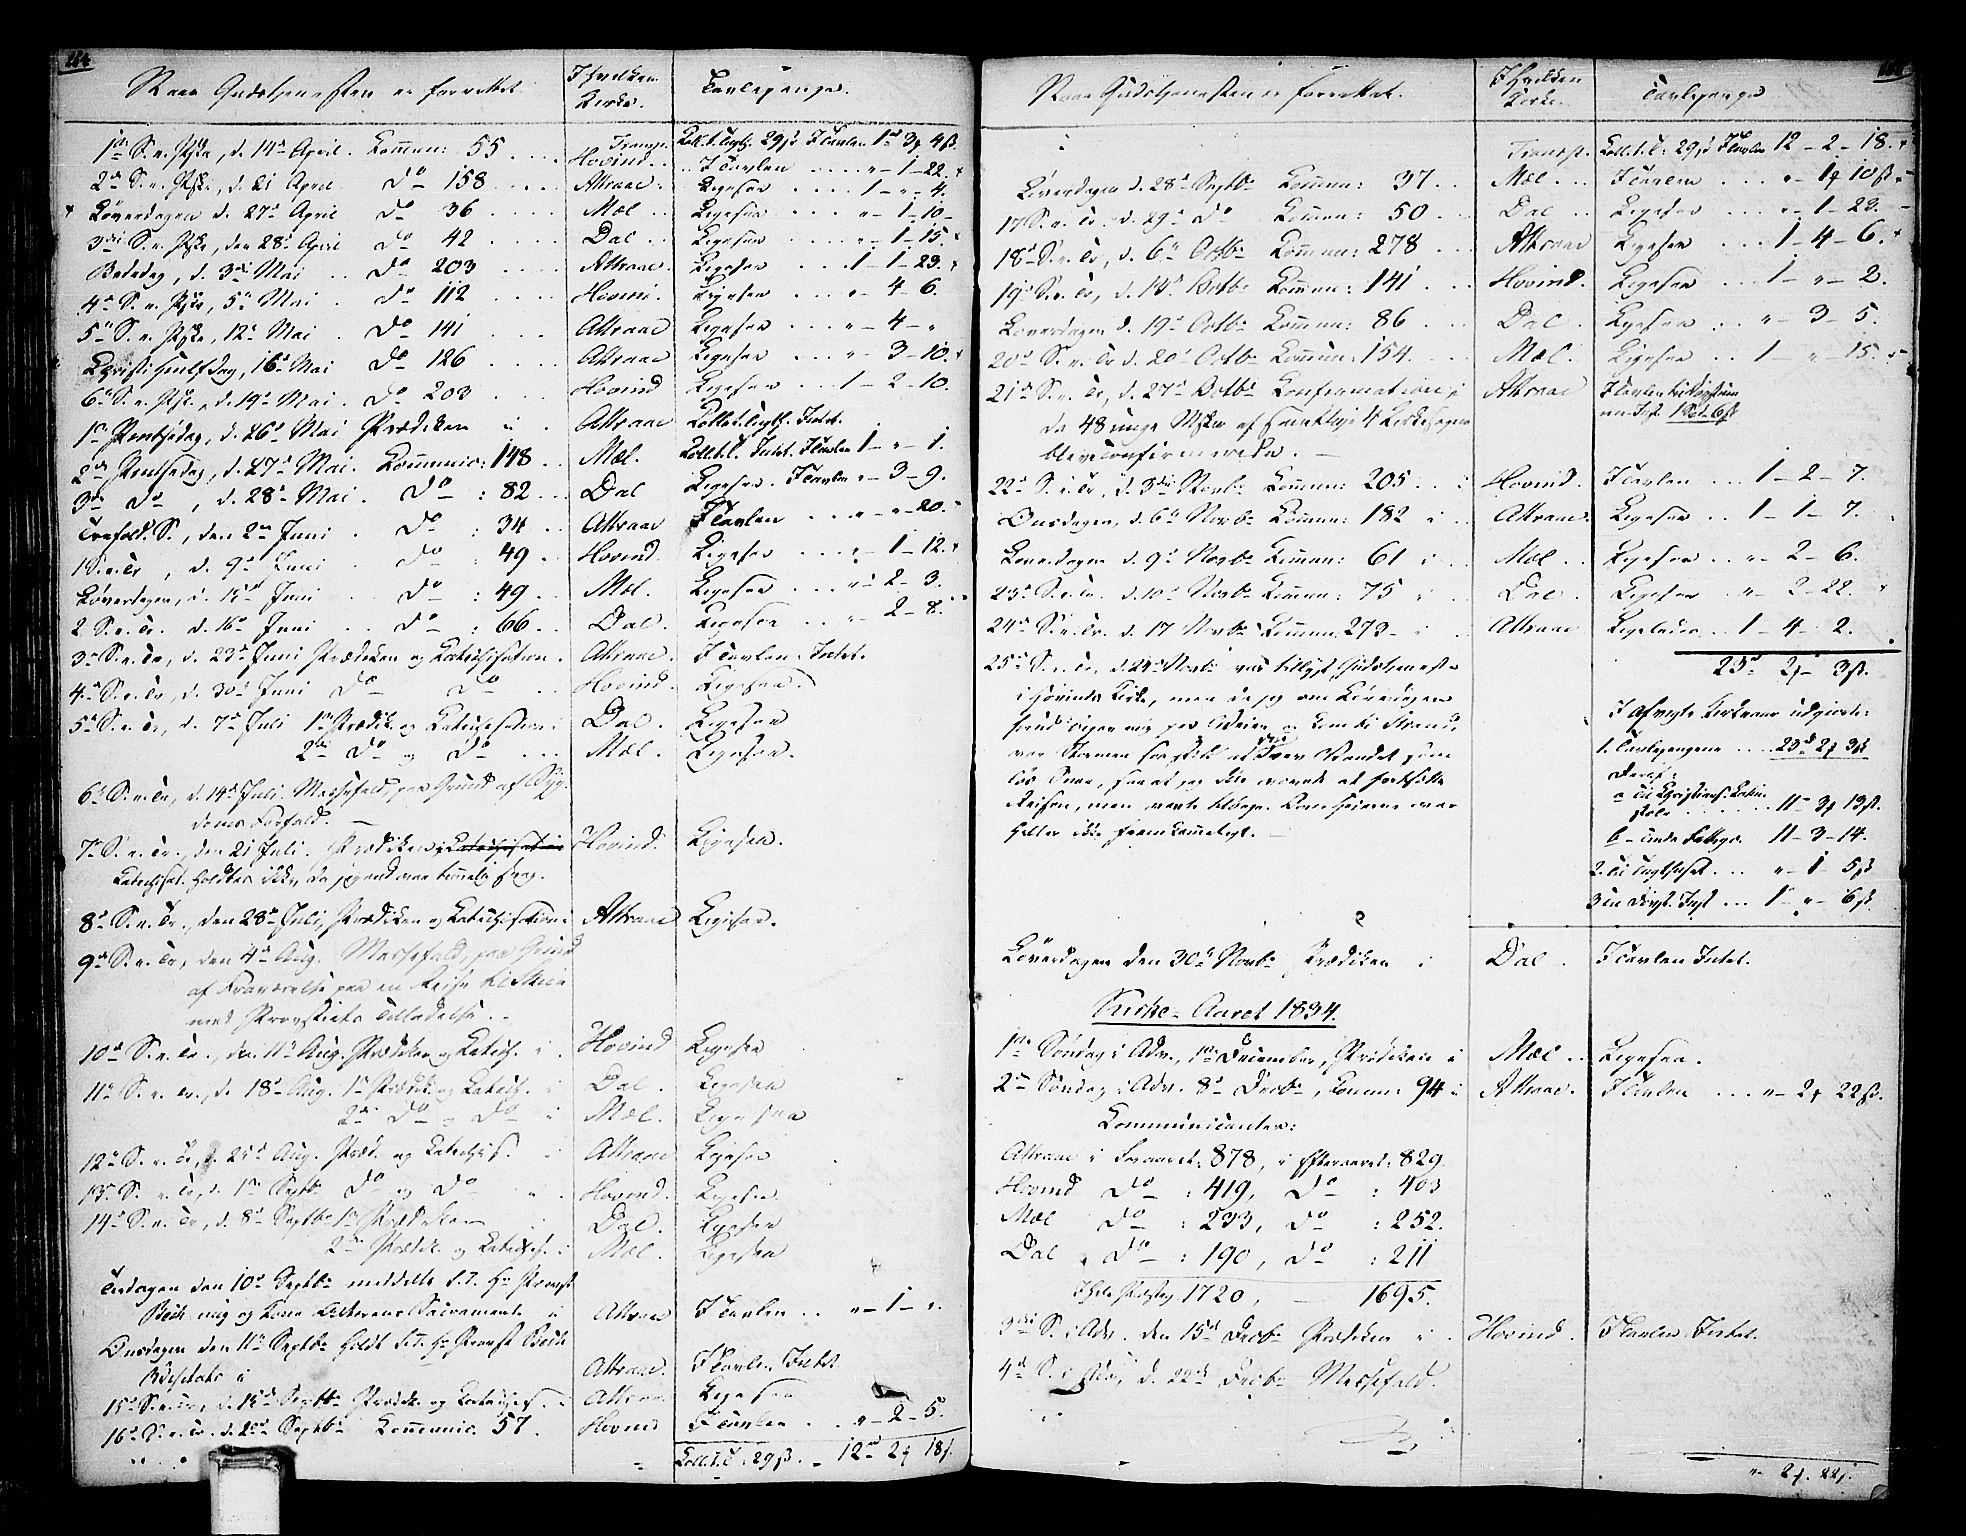 SAKO, Tinn kirkebøker, F/Fa/L0003: Ministerialbok nr. I 3, 1810-1814, s. 154-155